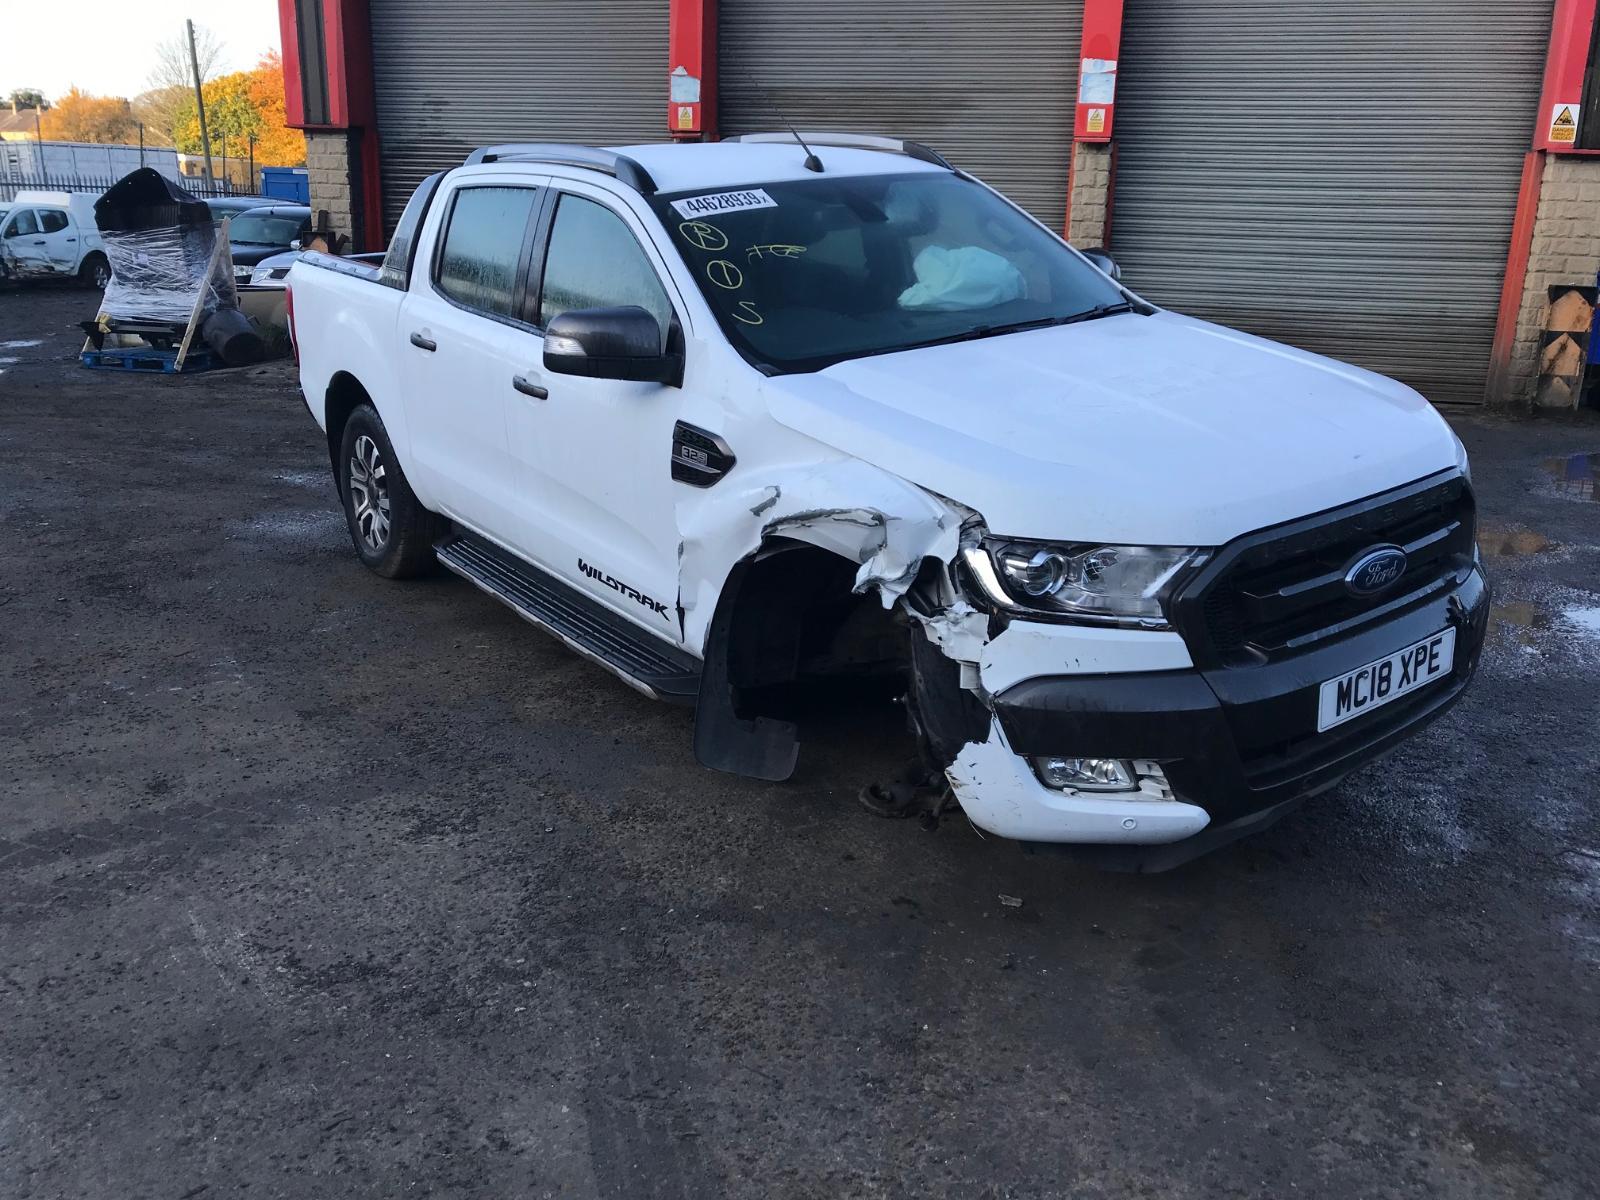 Image for a FORD RANGER 2018 4 Door Pickup